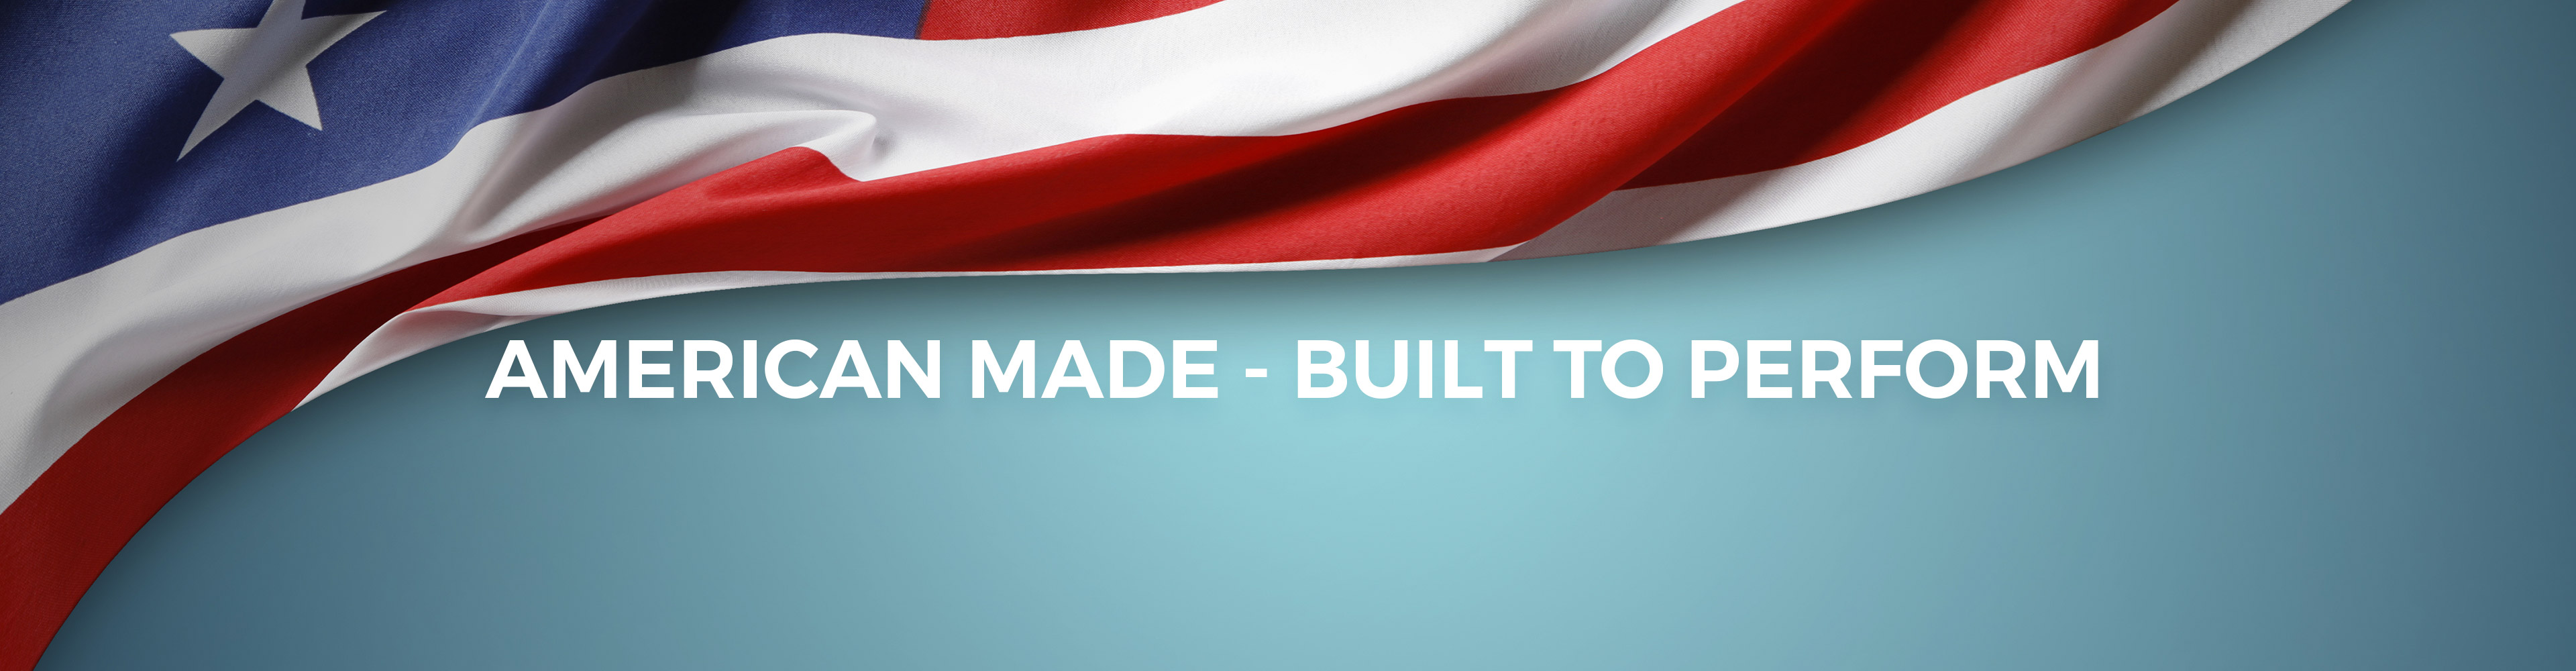 banner-american